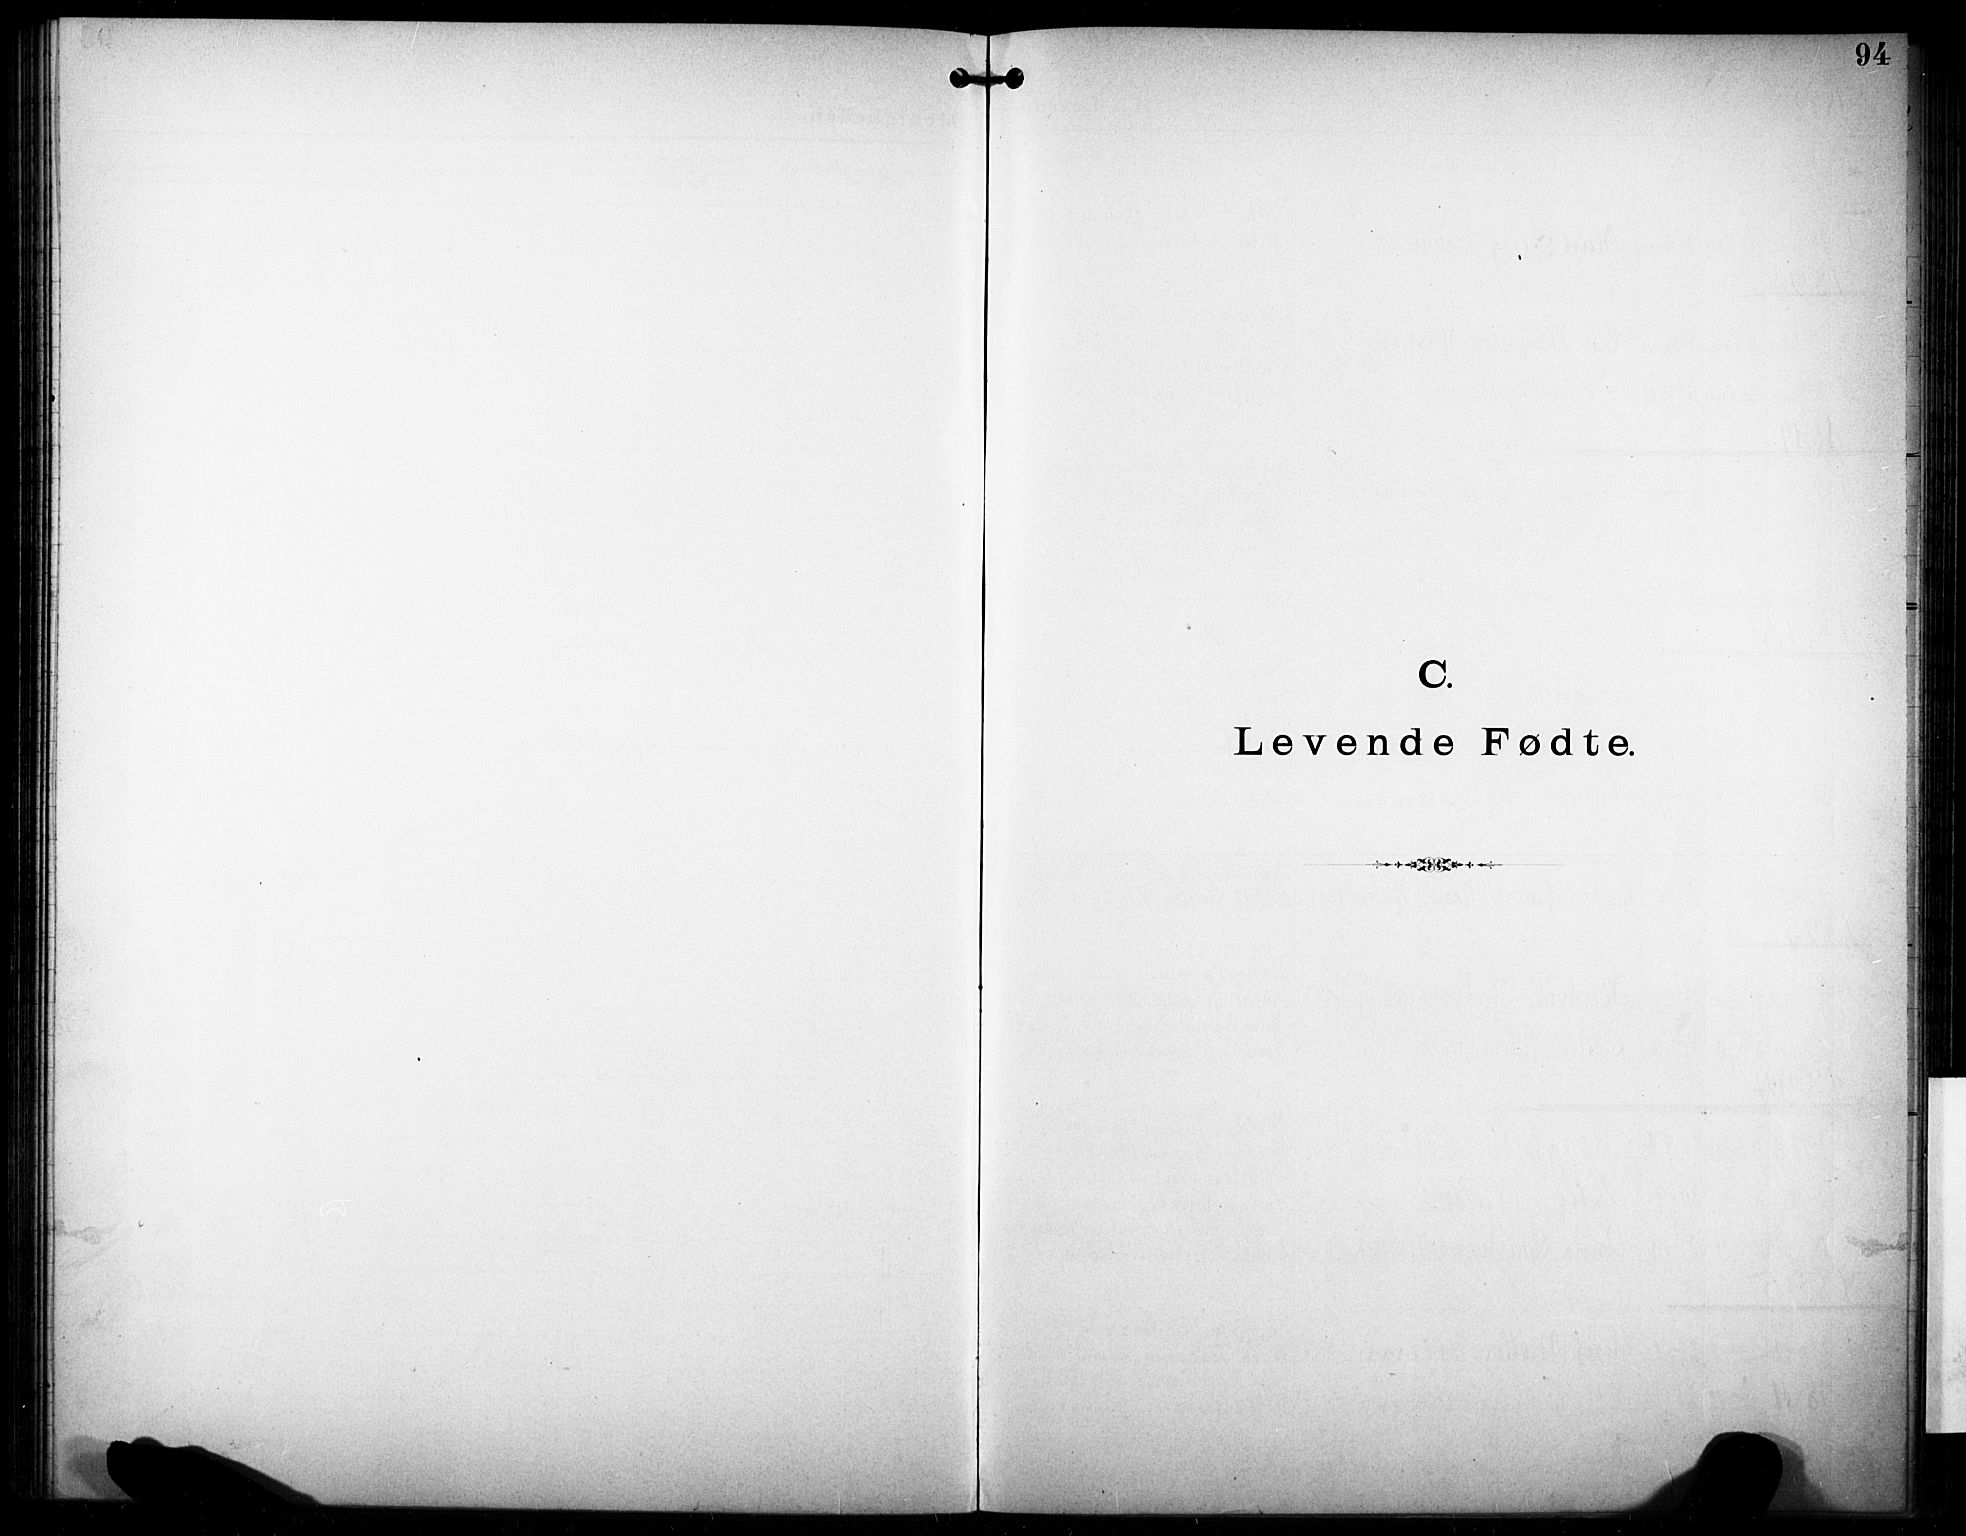 SAKO, Den katolsk-apostoliske menighet i Larvik, F/Fa/L0001: Dissenter register no. 1, 1892-1933, p. 94